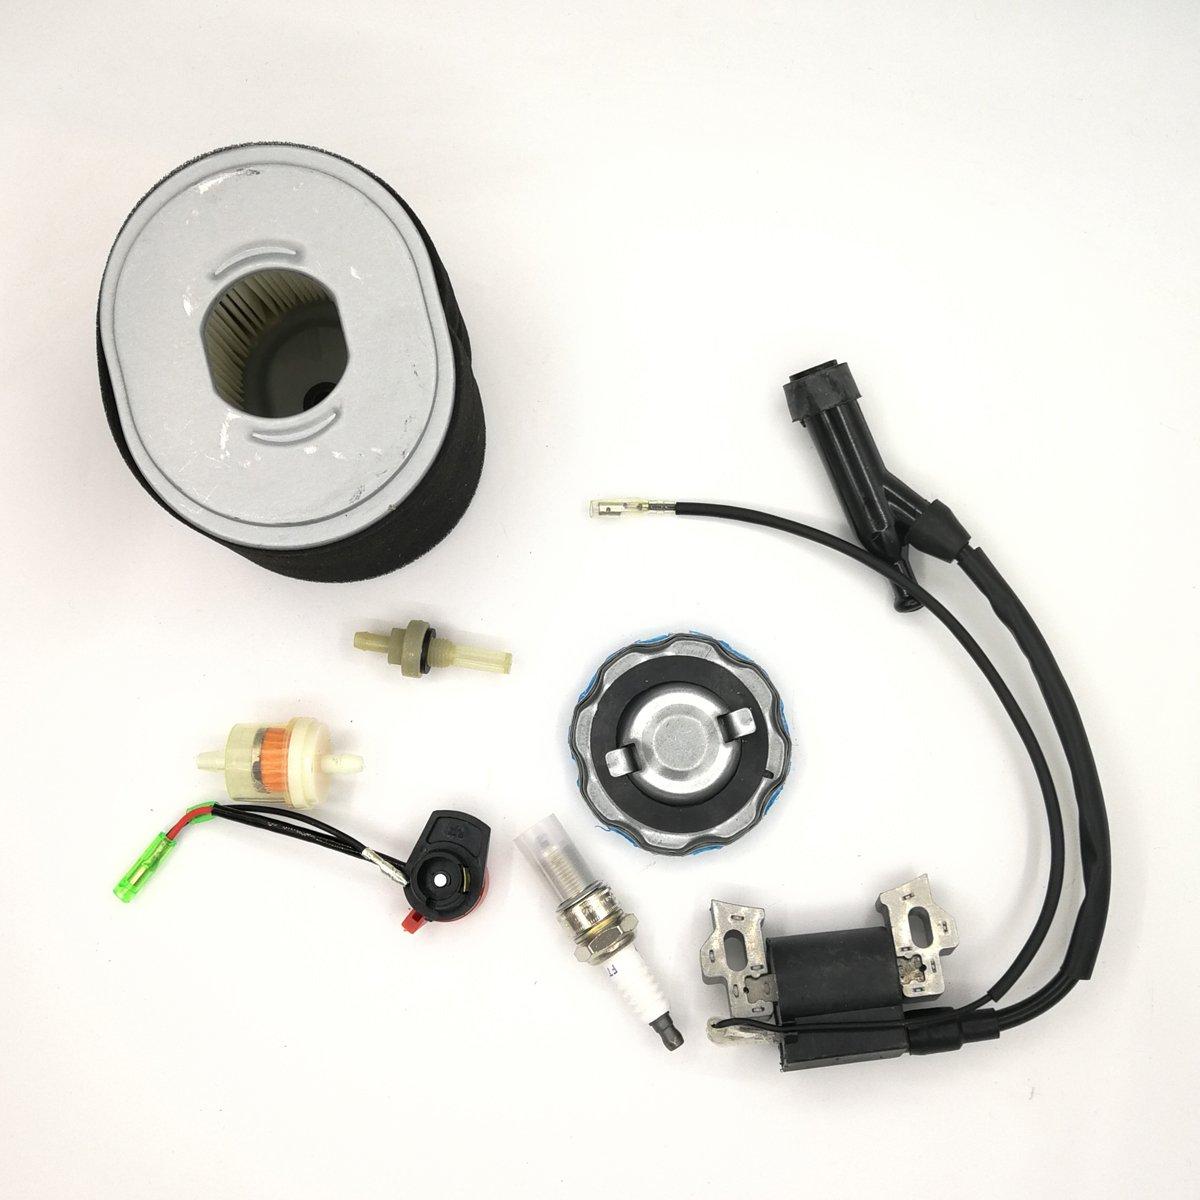 Shioshen Ignition Coil Magneto Luftfilter Gas Fuel Cap Filter Service-Kit f/ür Honda GX340 GX390 188F 190F Motor Generator Rasenm/äher